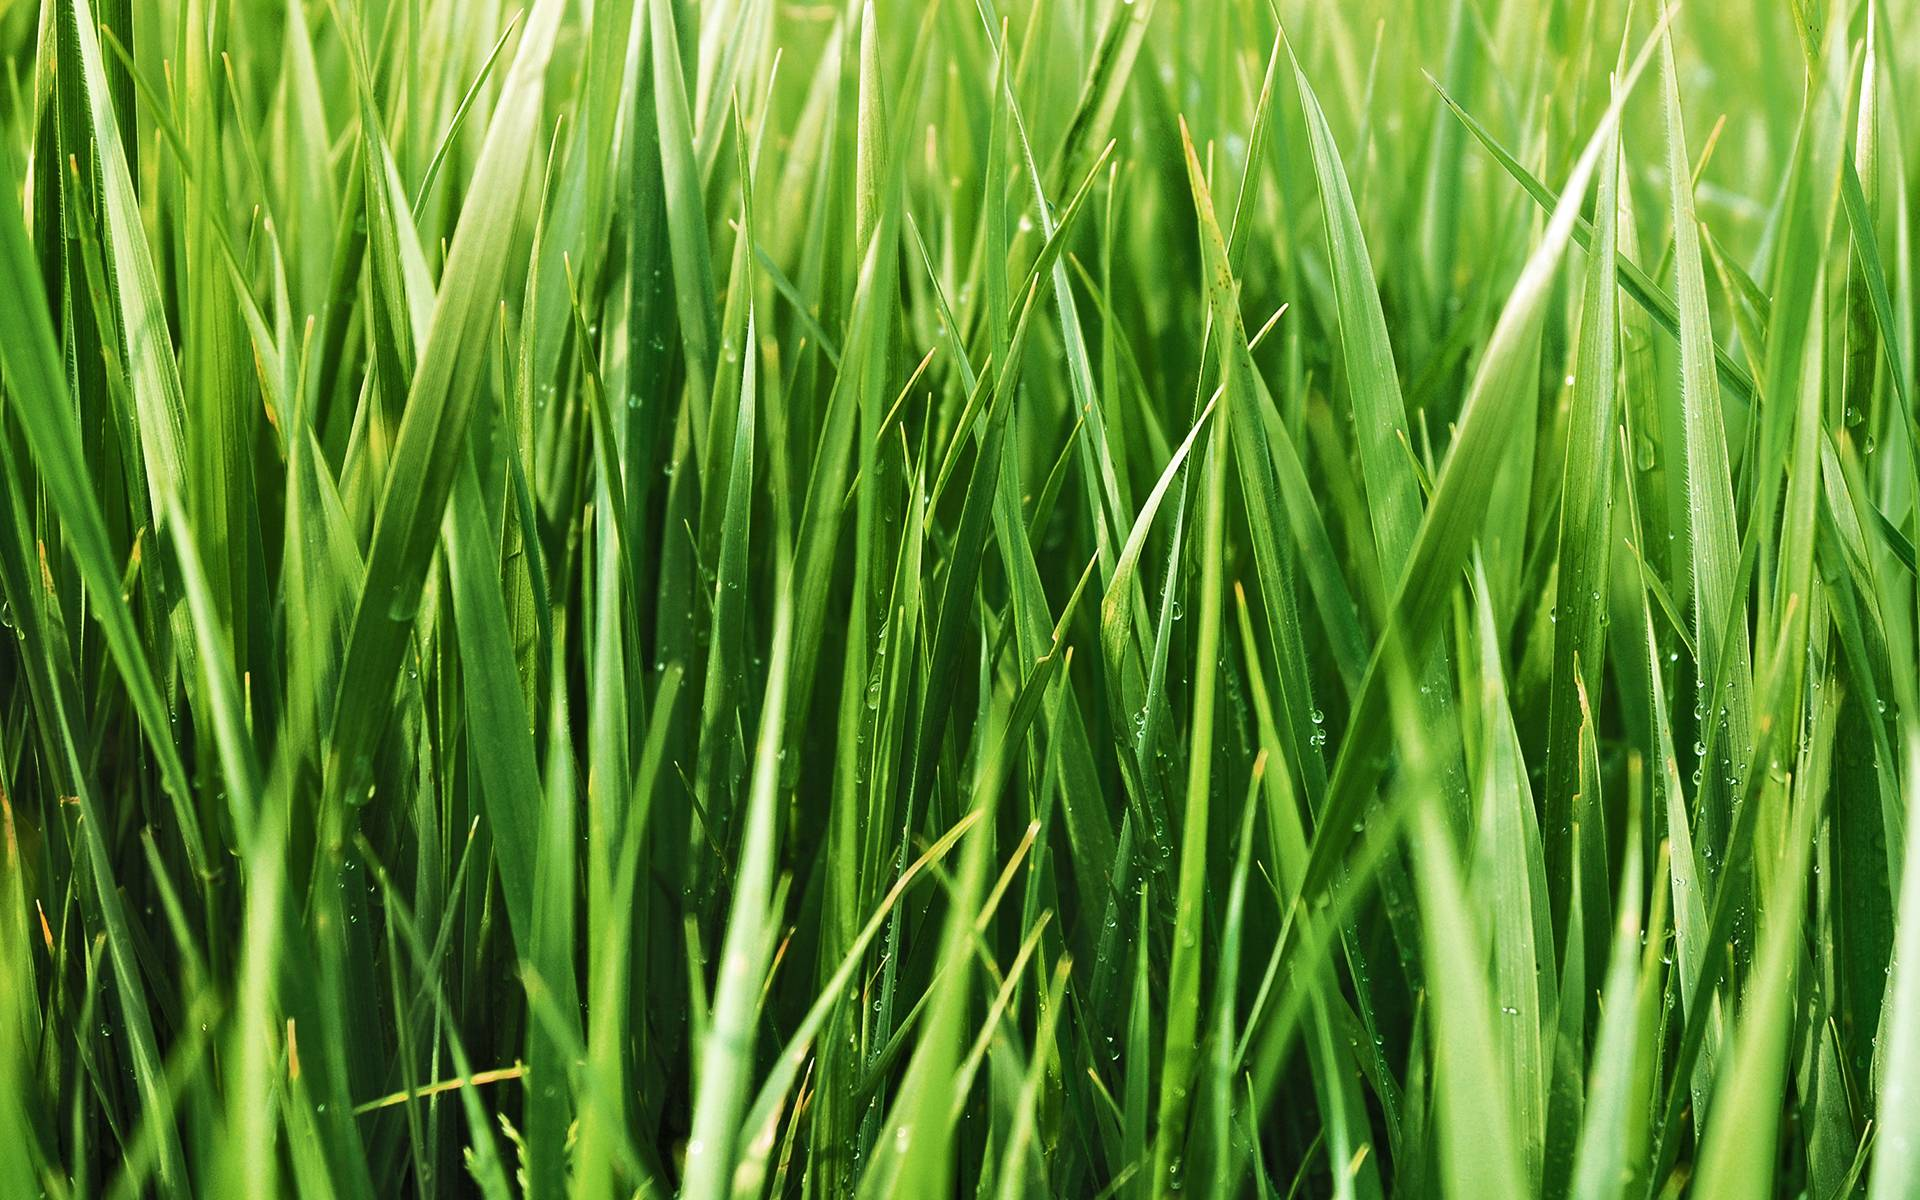 Grass Blades Background Gratis Penselen - (2.828 Gratis ...